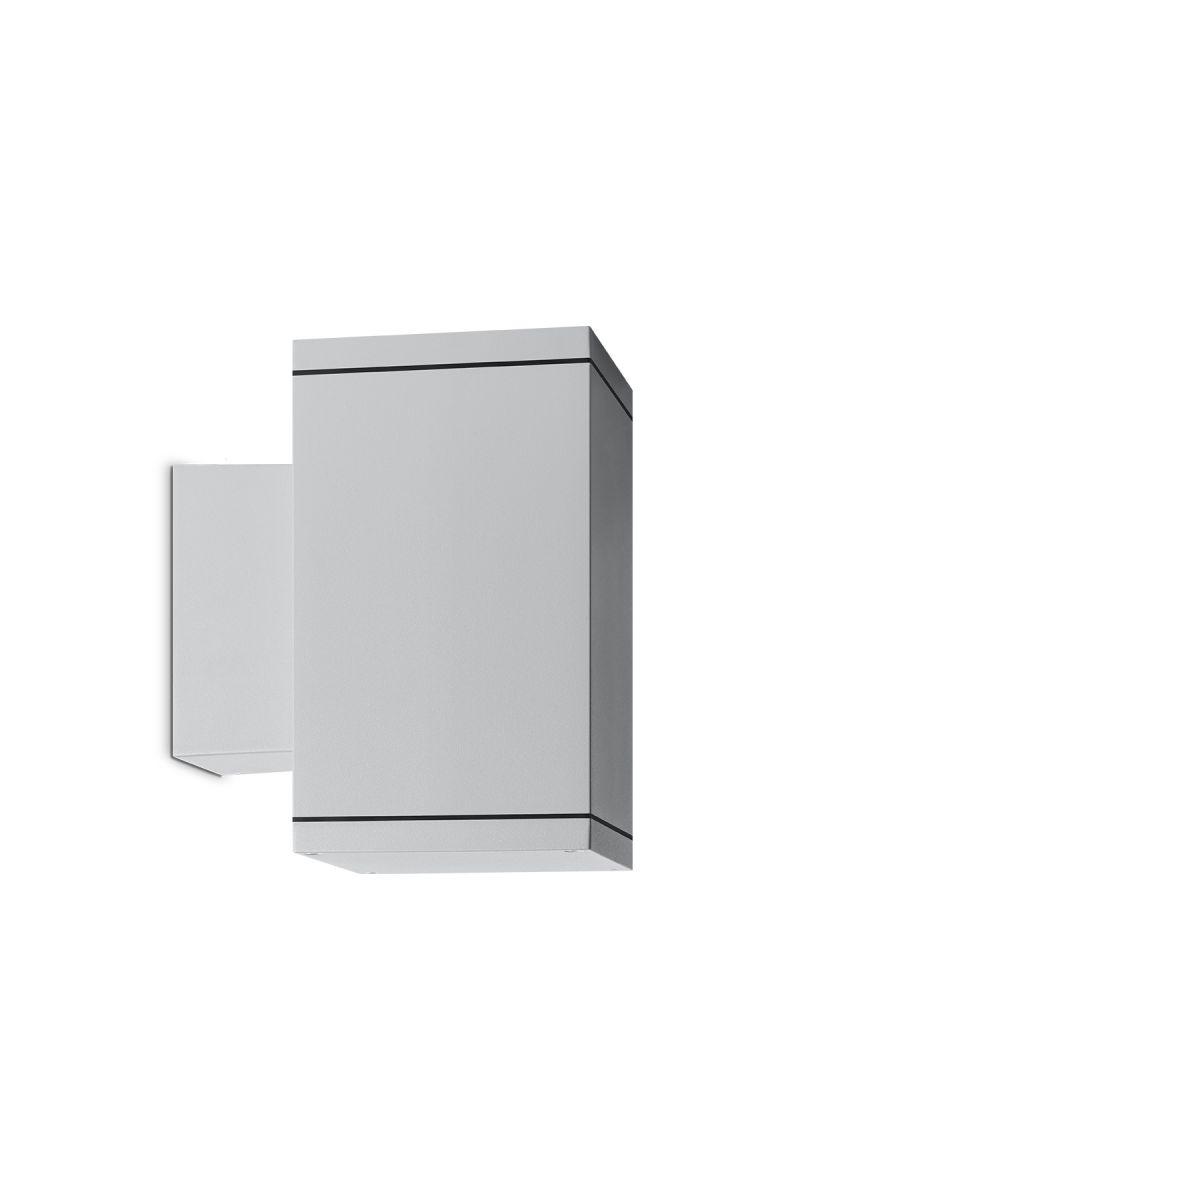 Maxi CORE - Wall Uplight